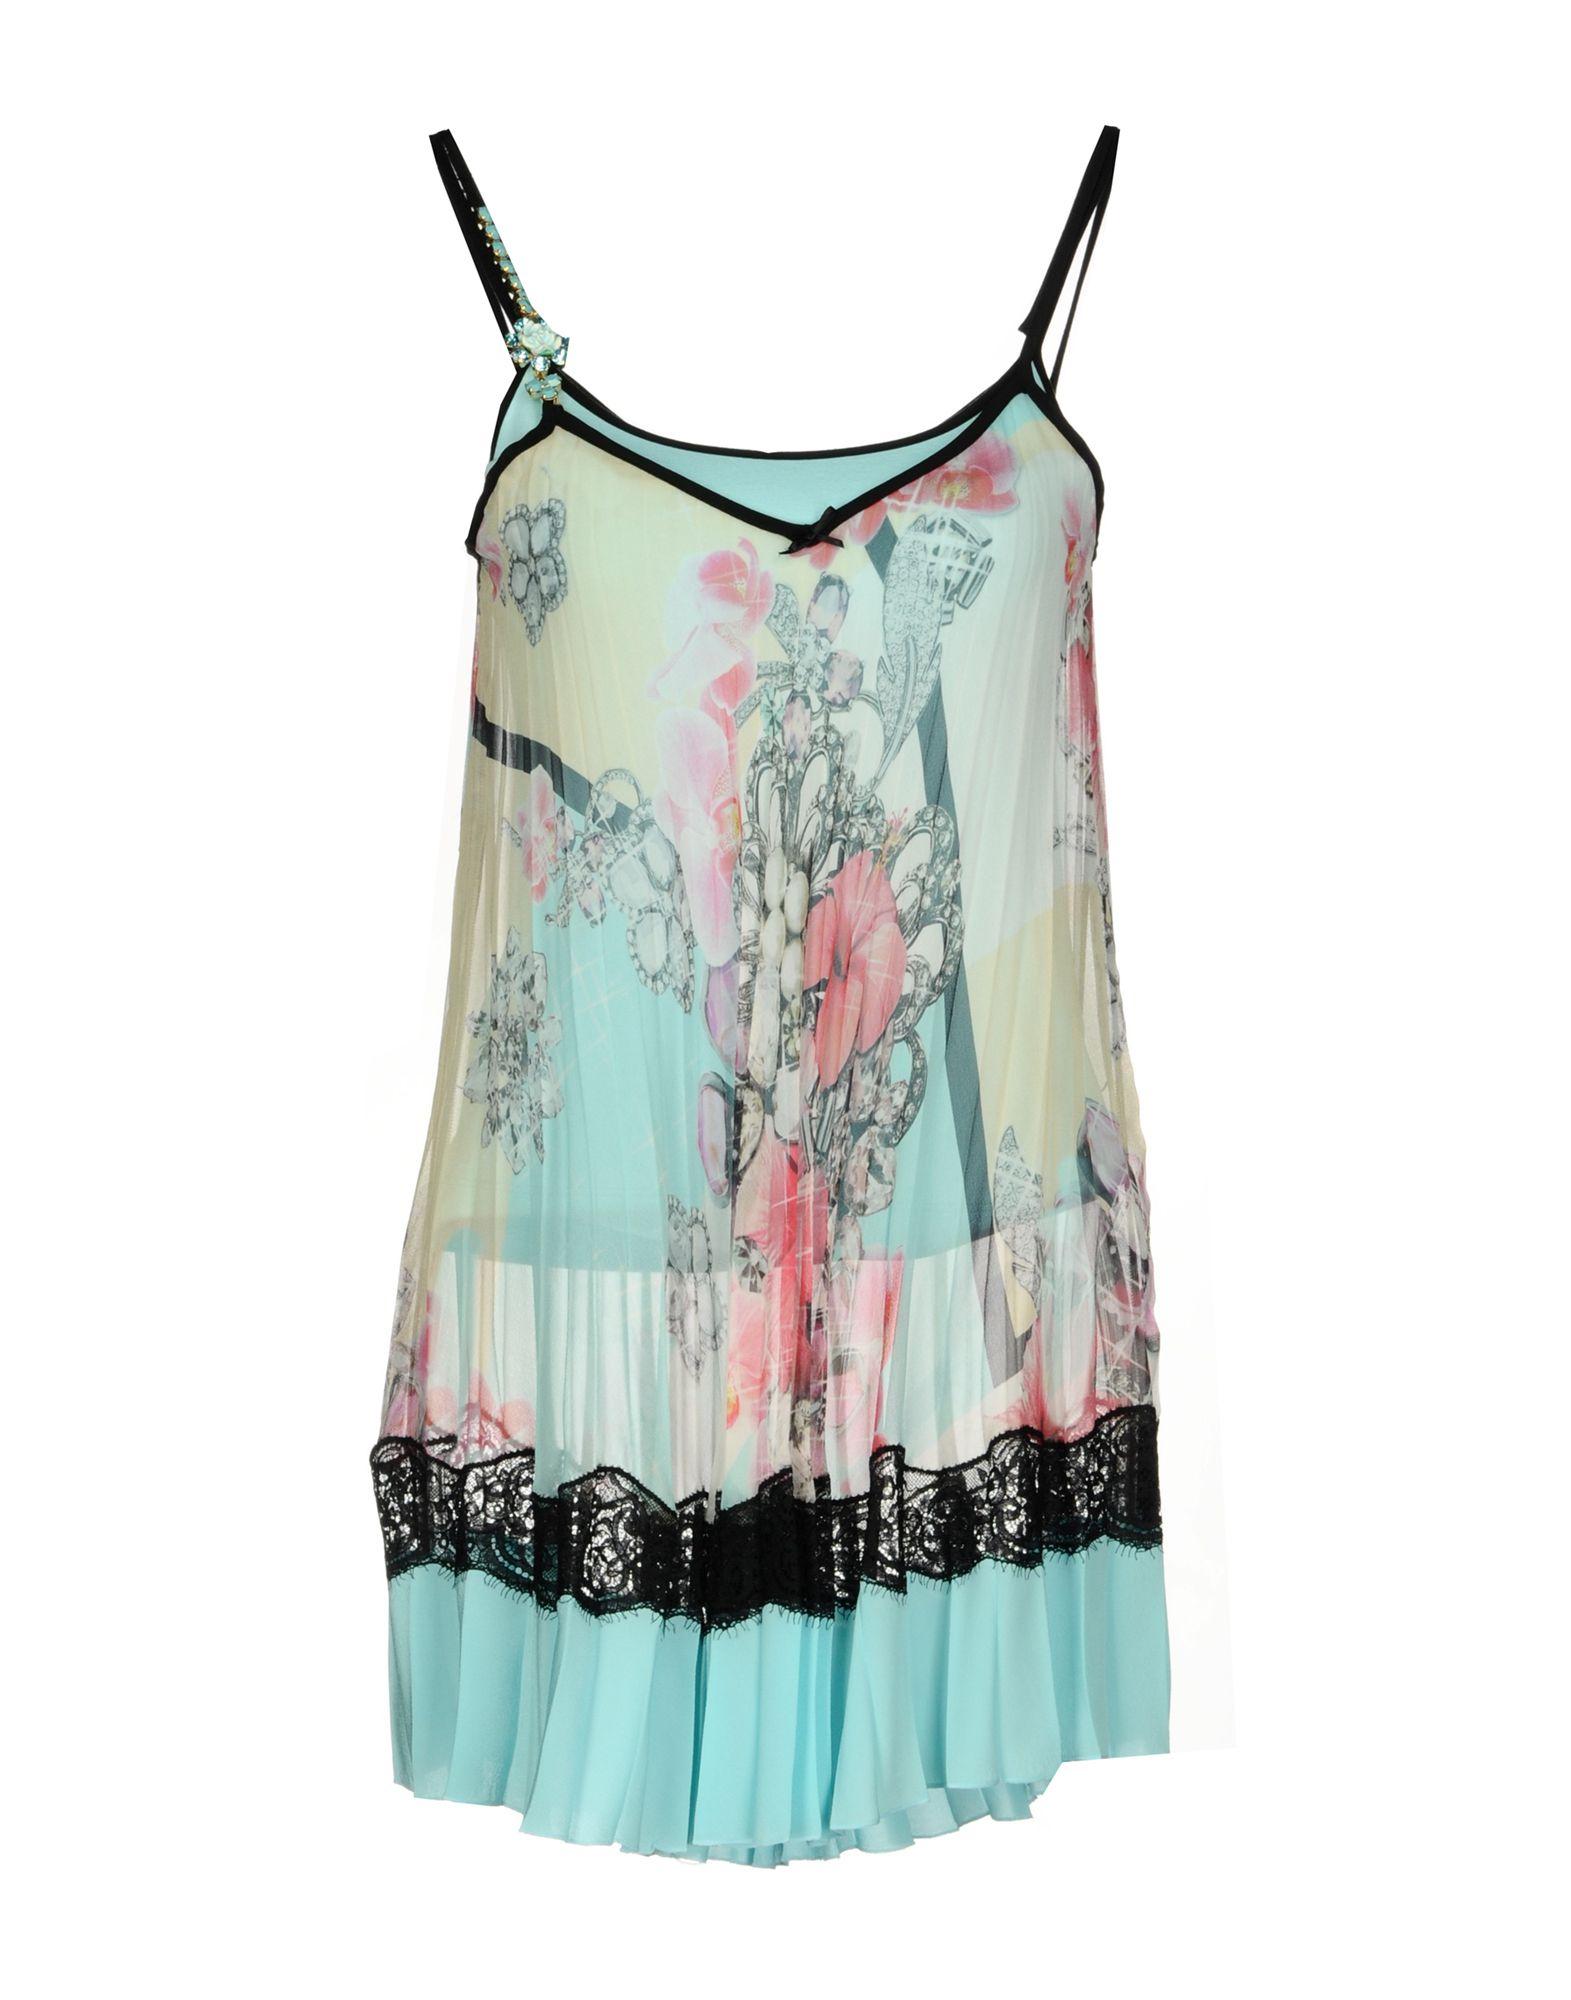 Top Vdp Collection Donna - Acquista online su LsLJXT14